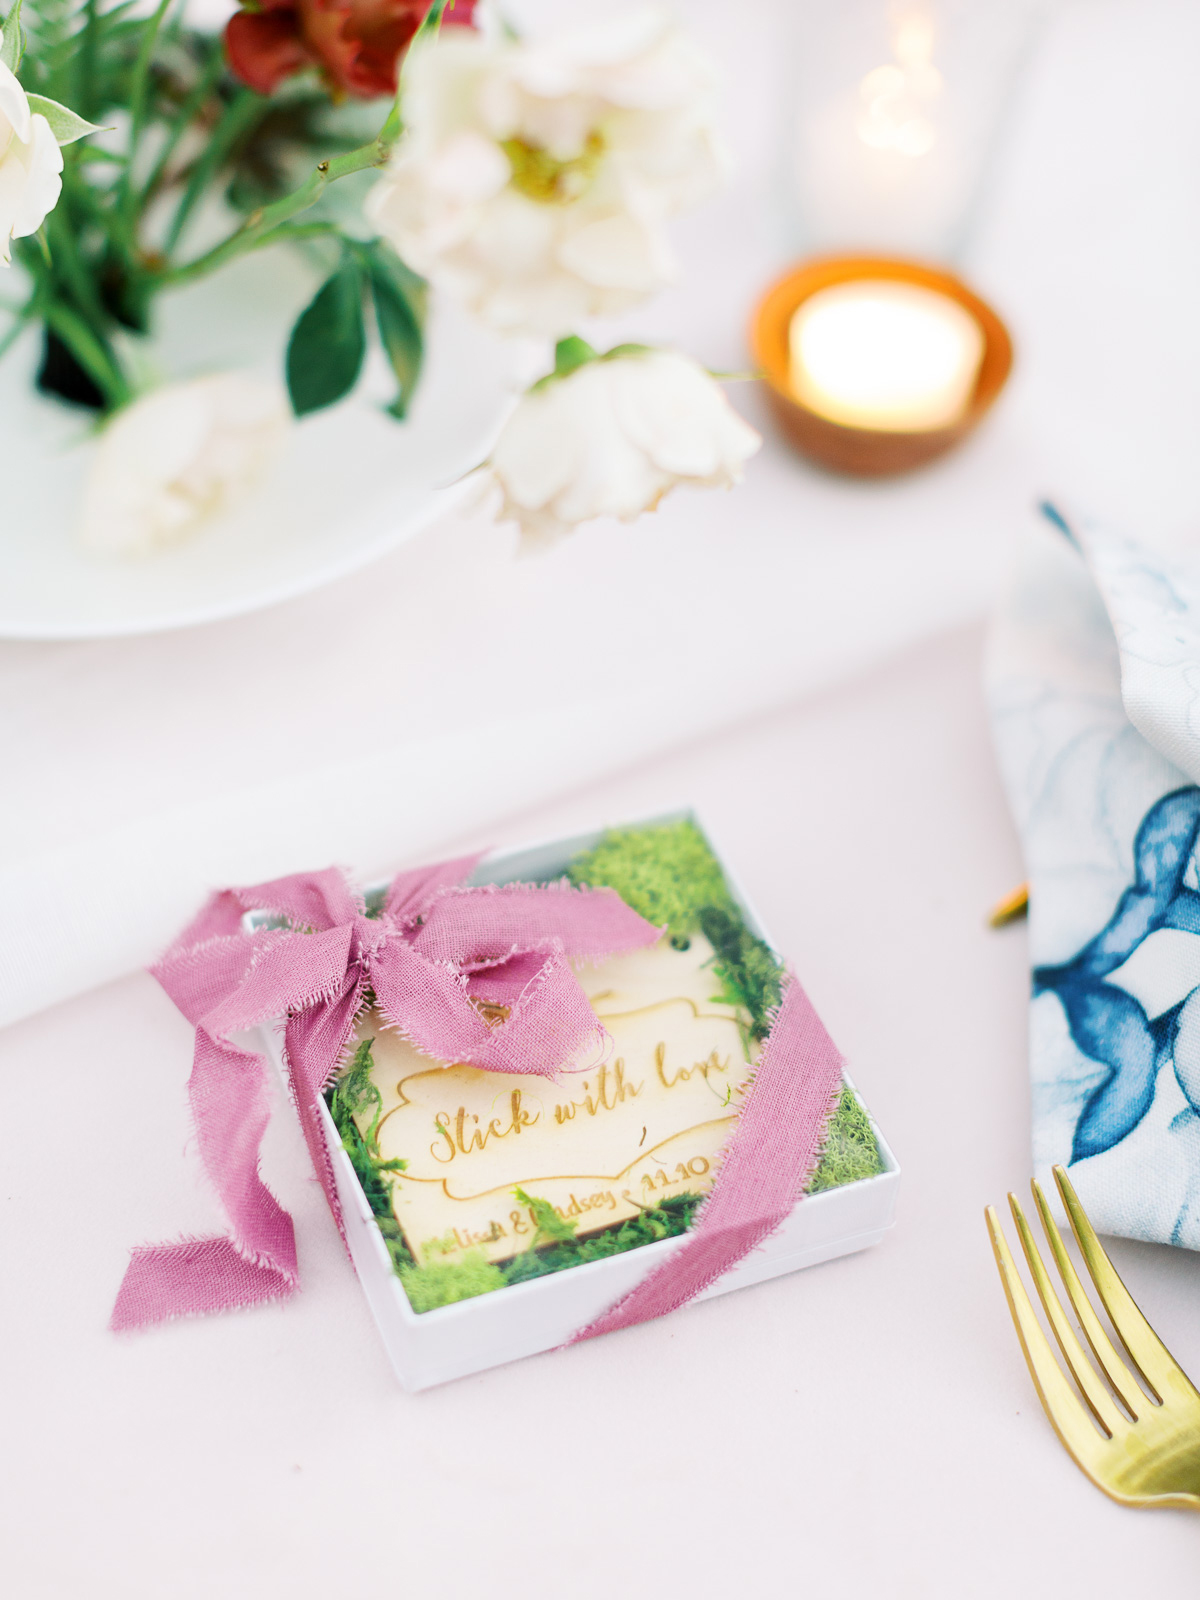 melissa lindsey wedding favors